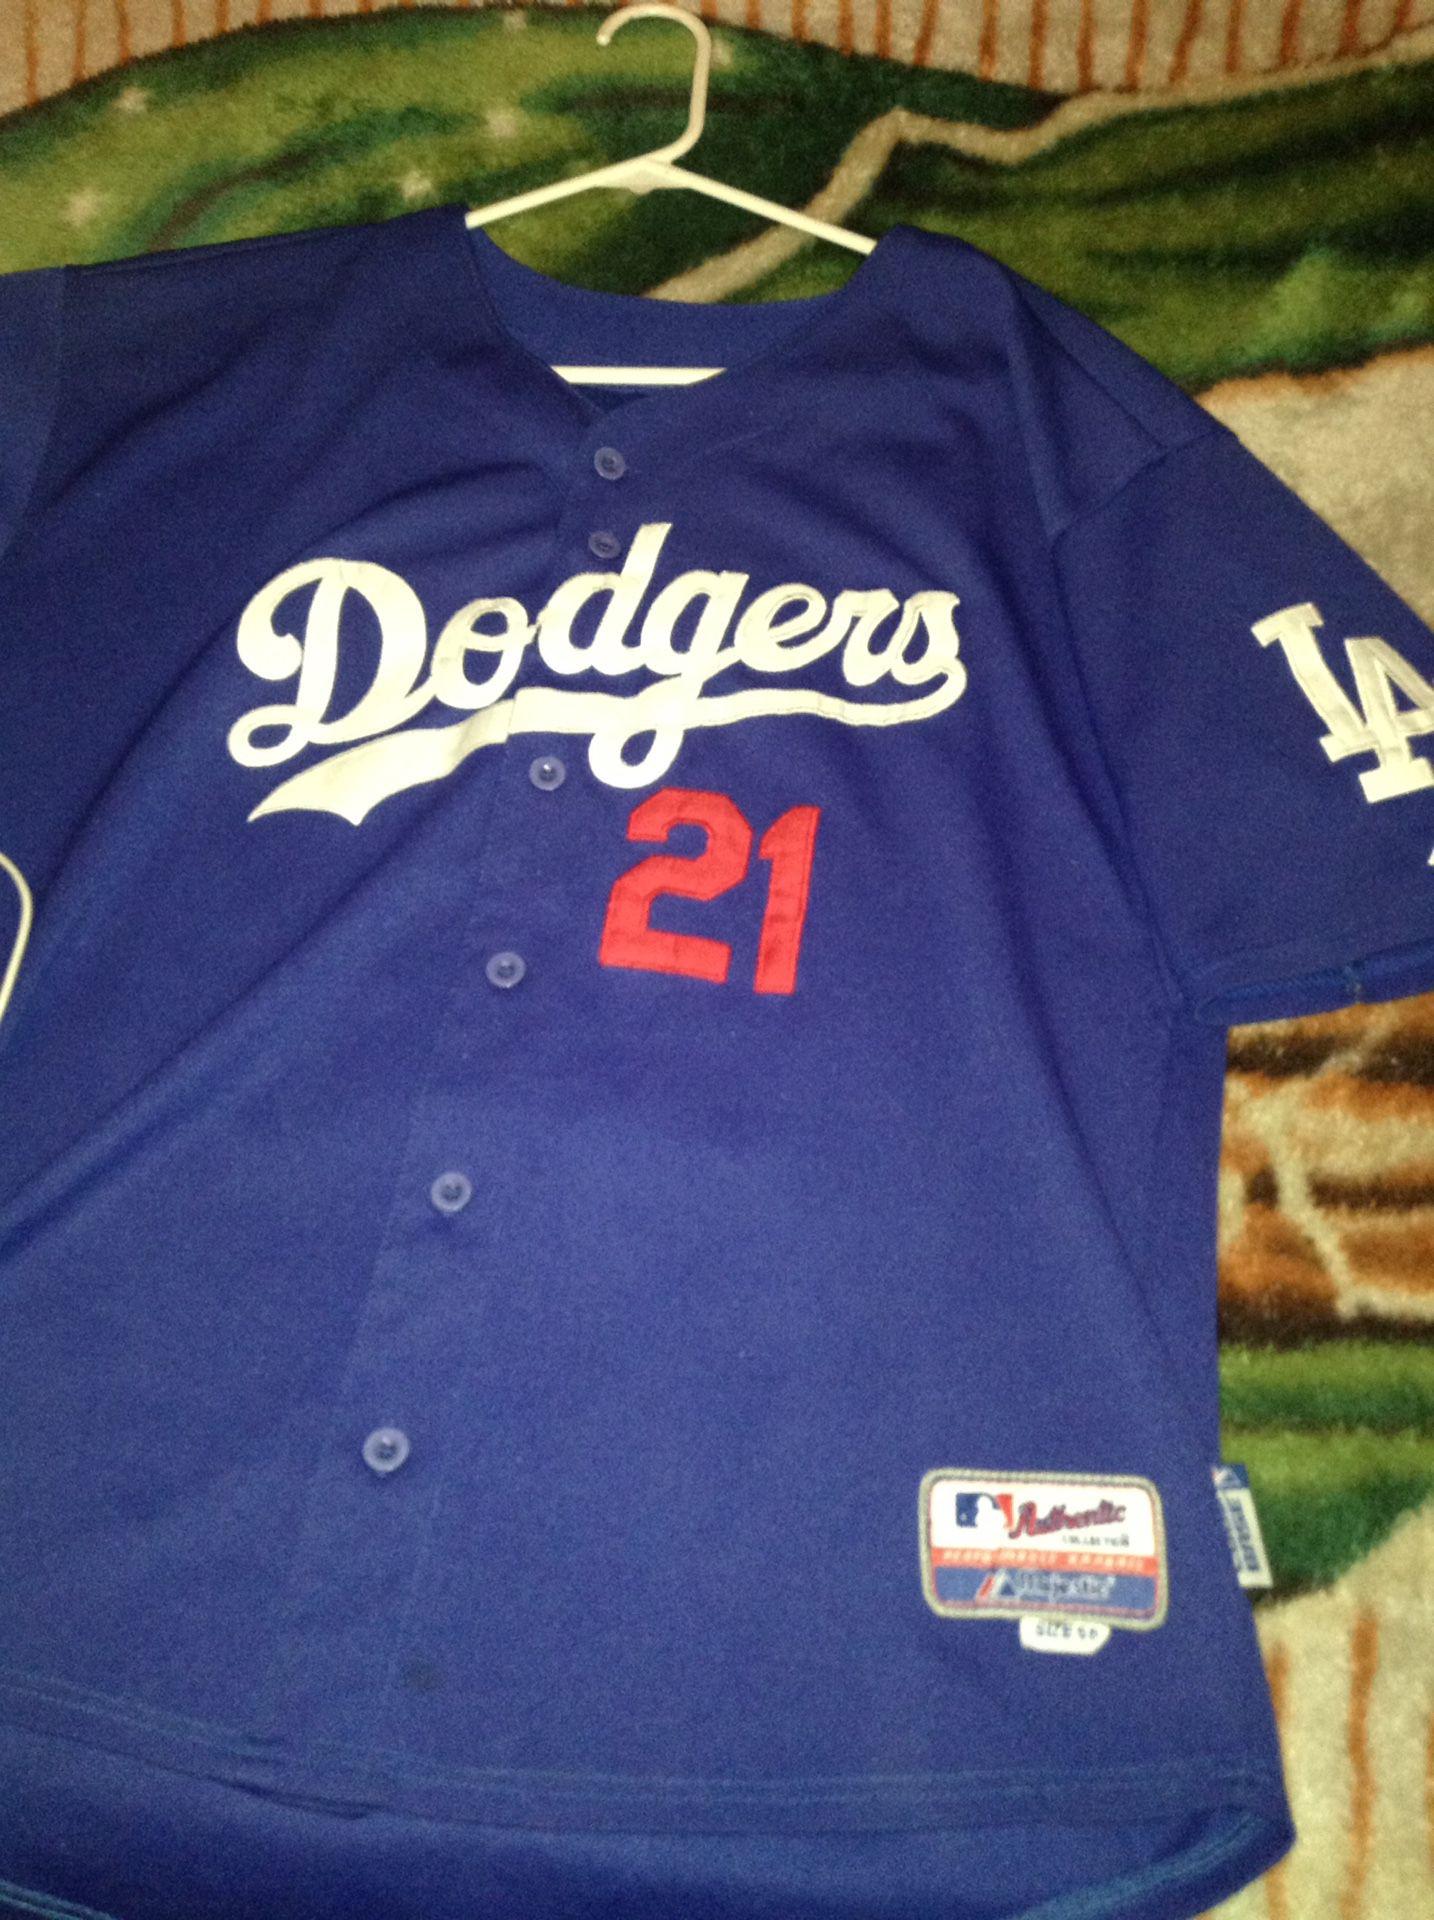 Dodgers jersey M